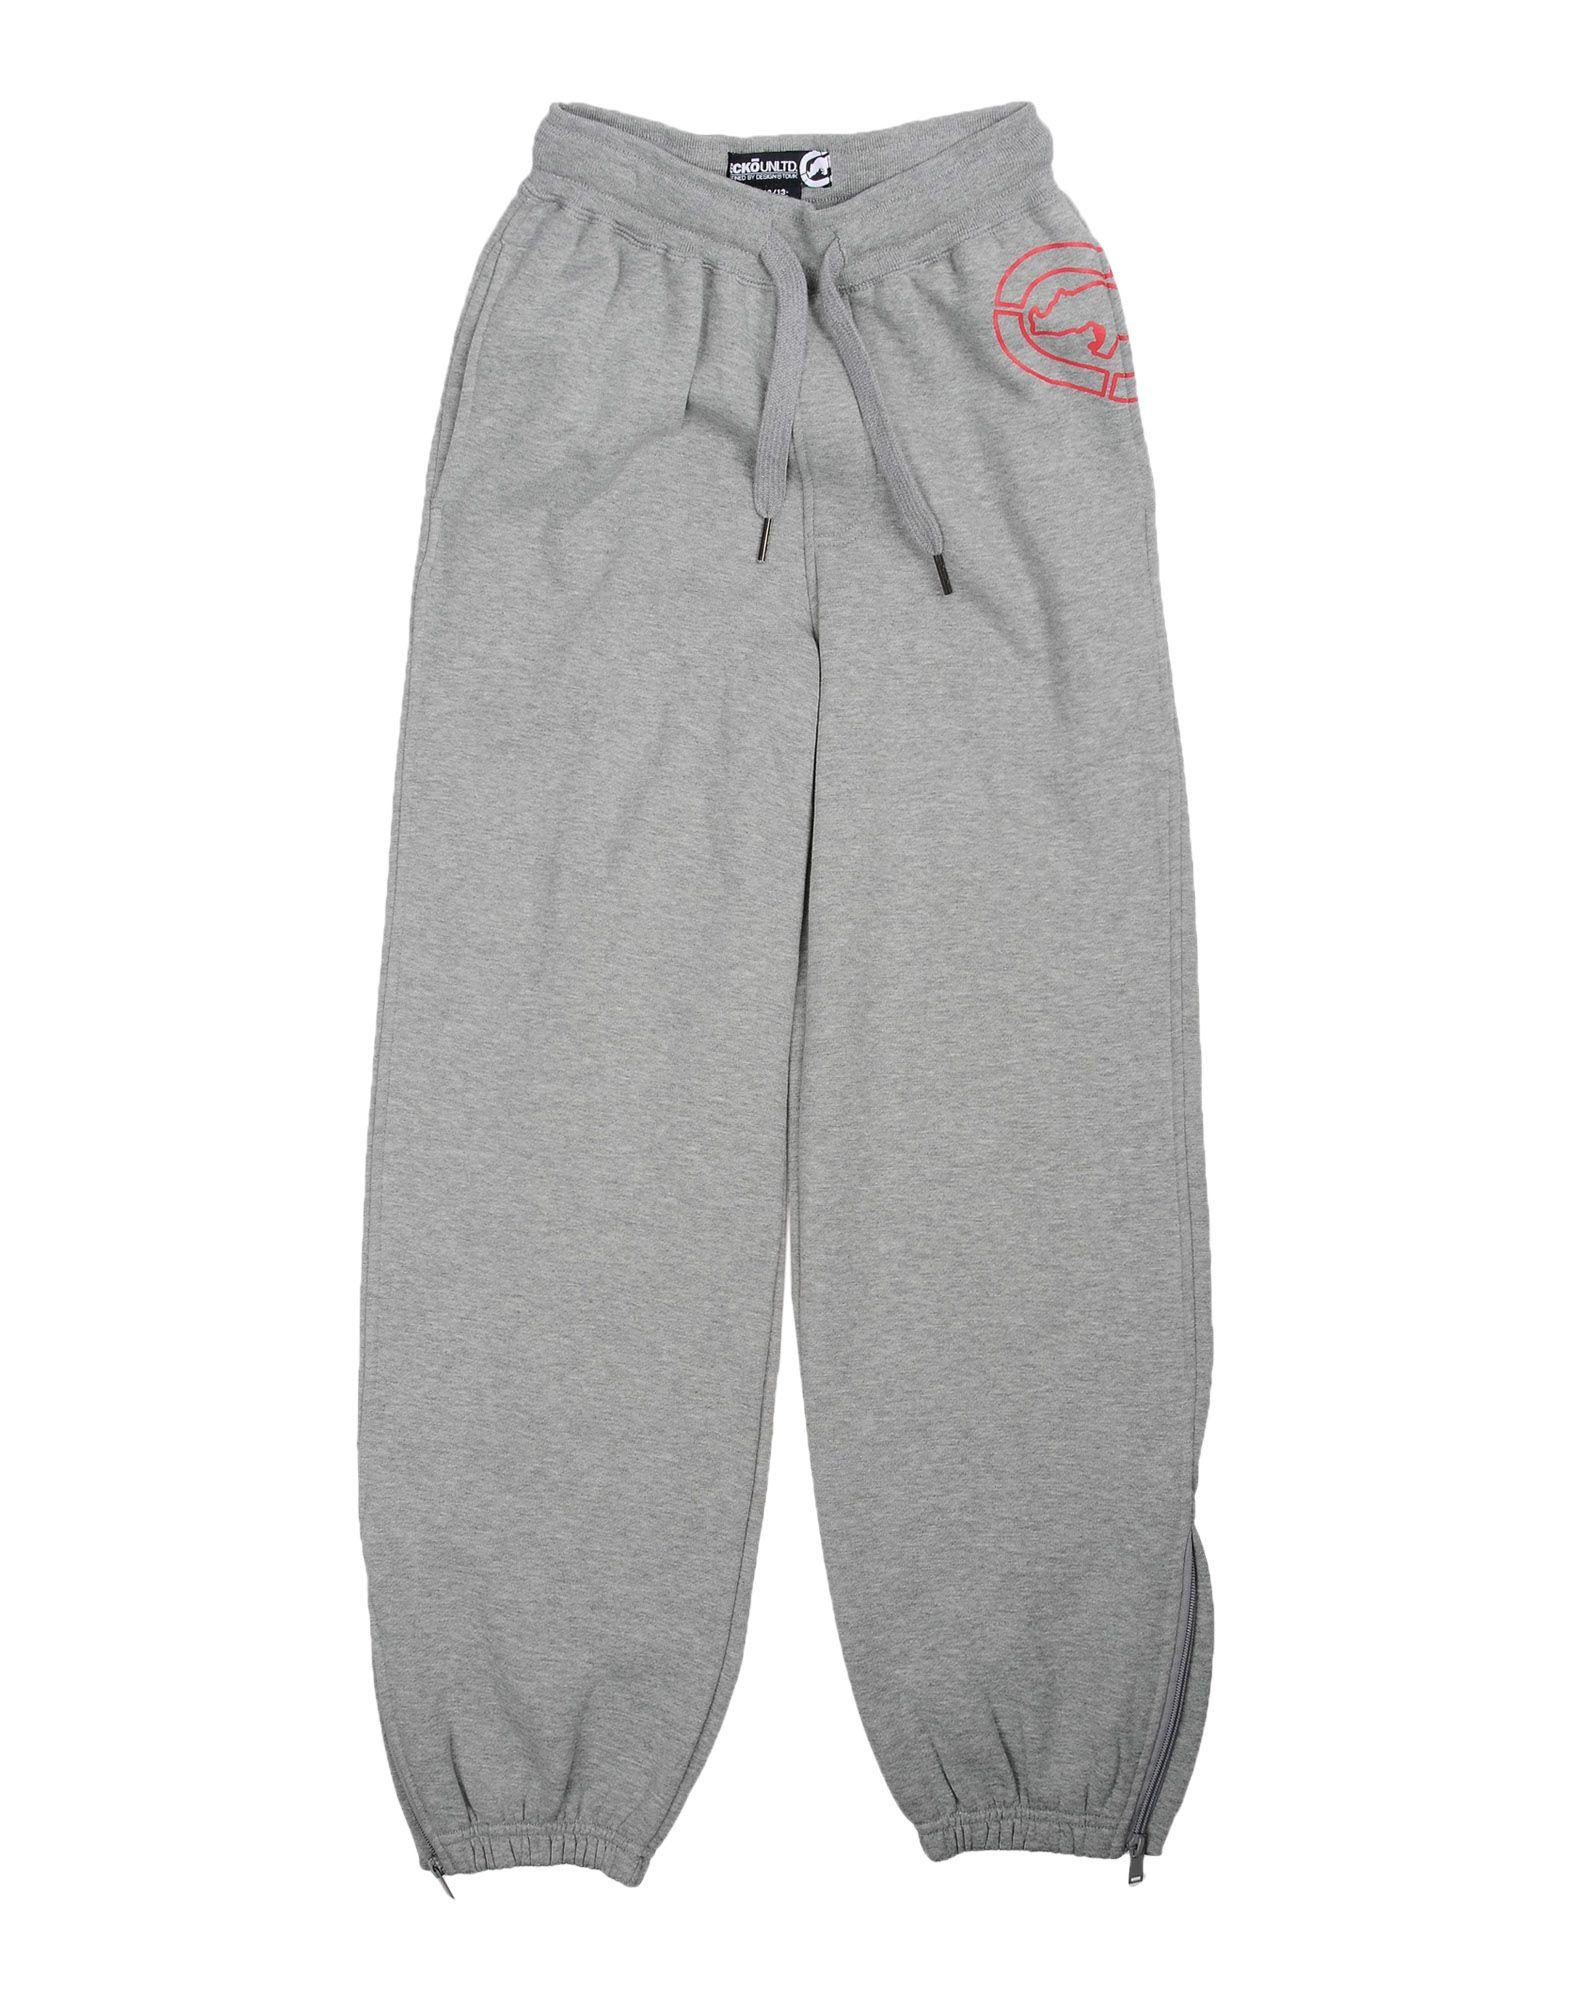 ECKO UNLTD Casual pants